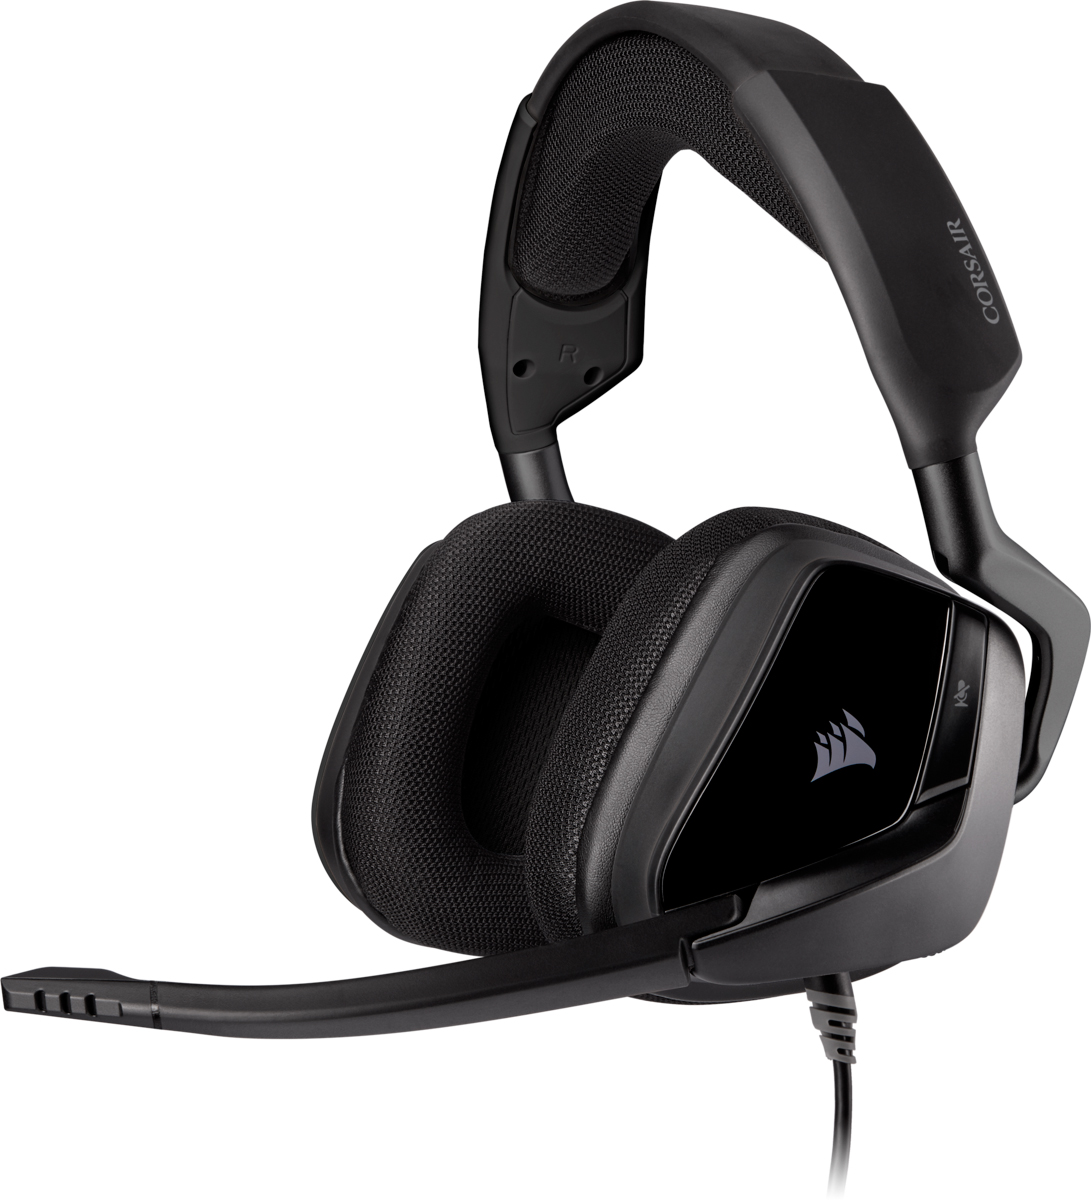 Игровая гарнитура Corsair Gaming VOID Elite Surround CA-9011205-EU Carbon